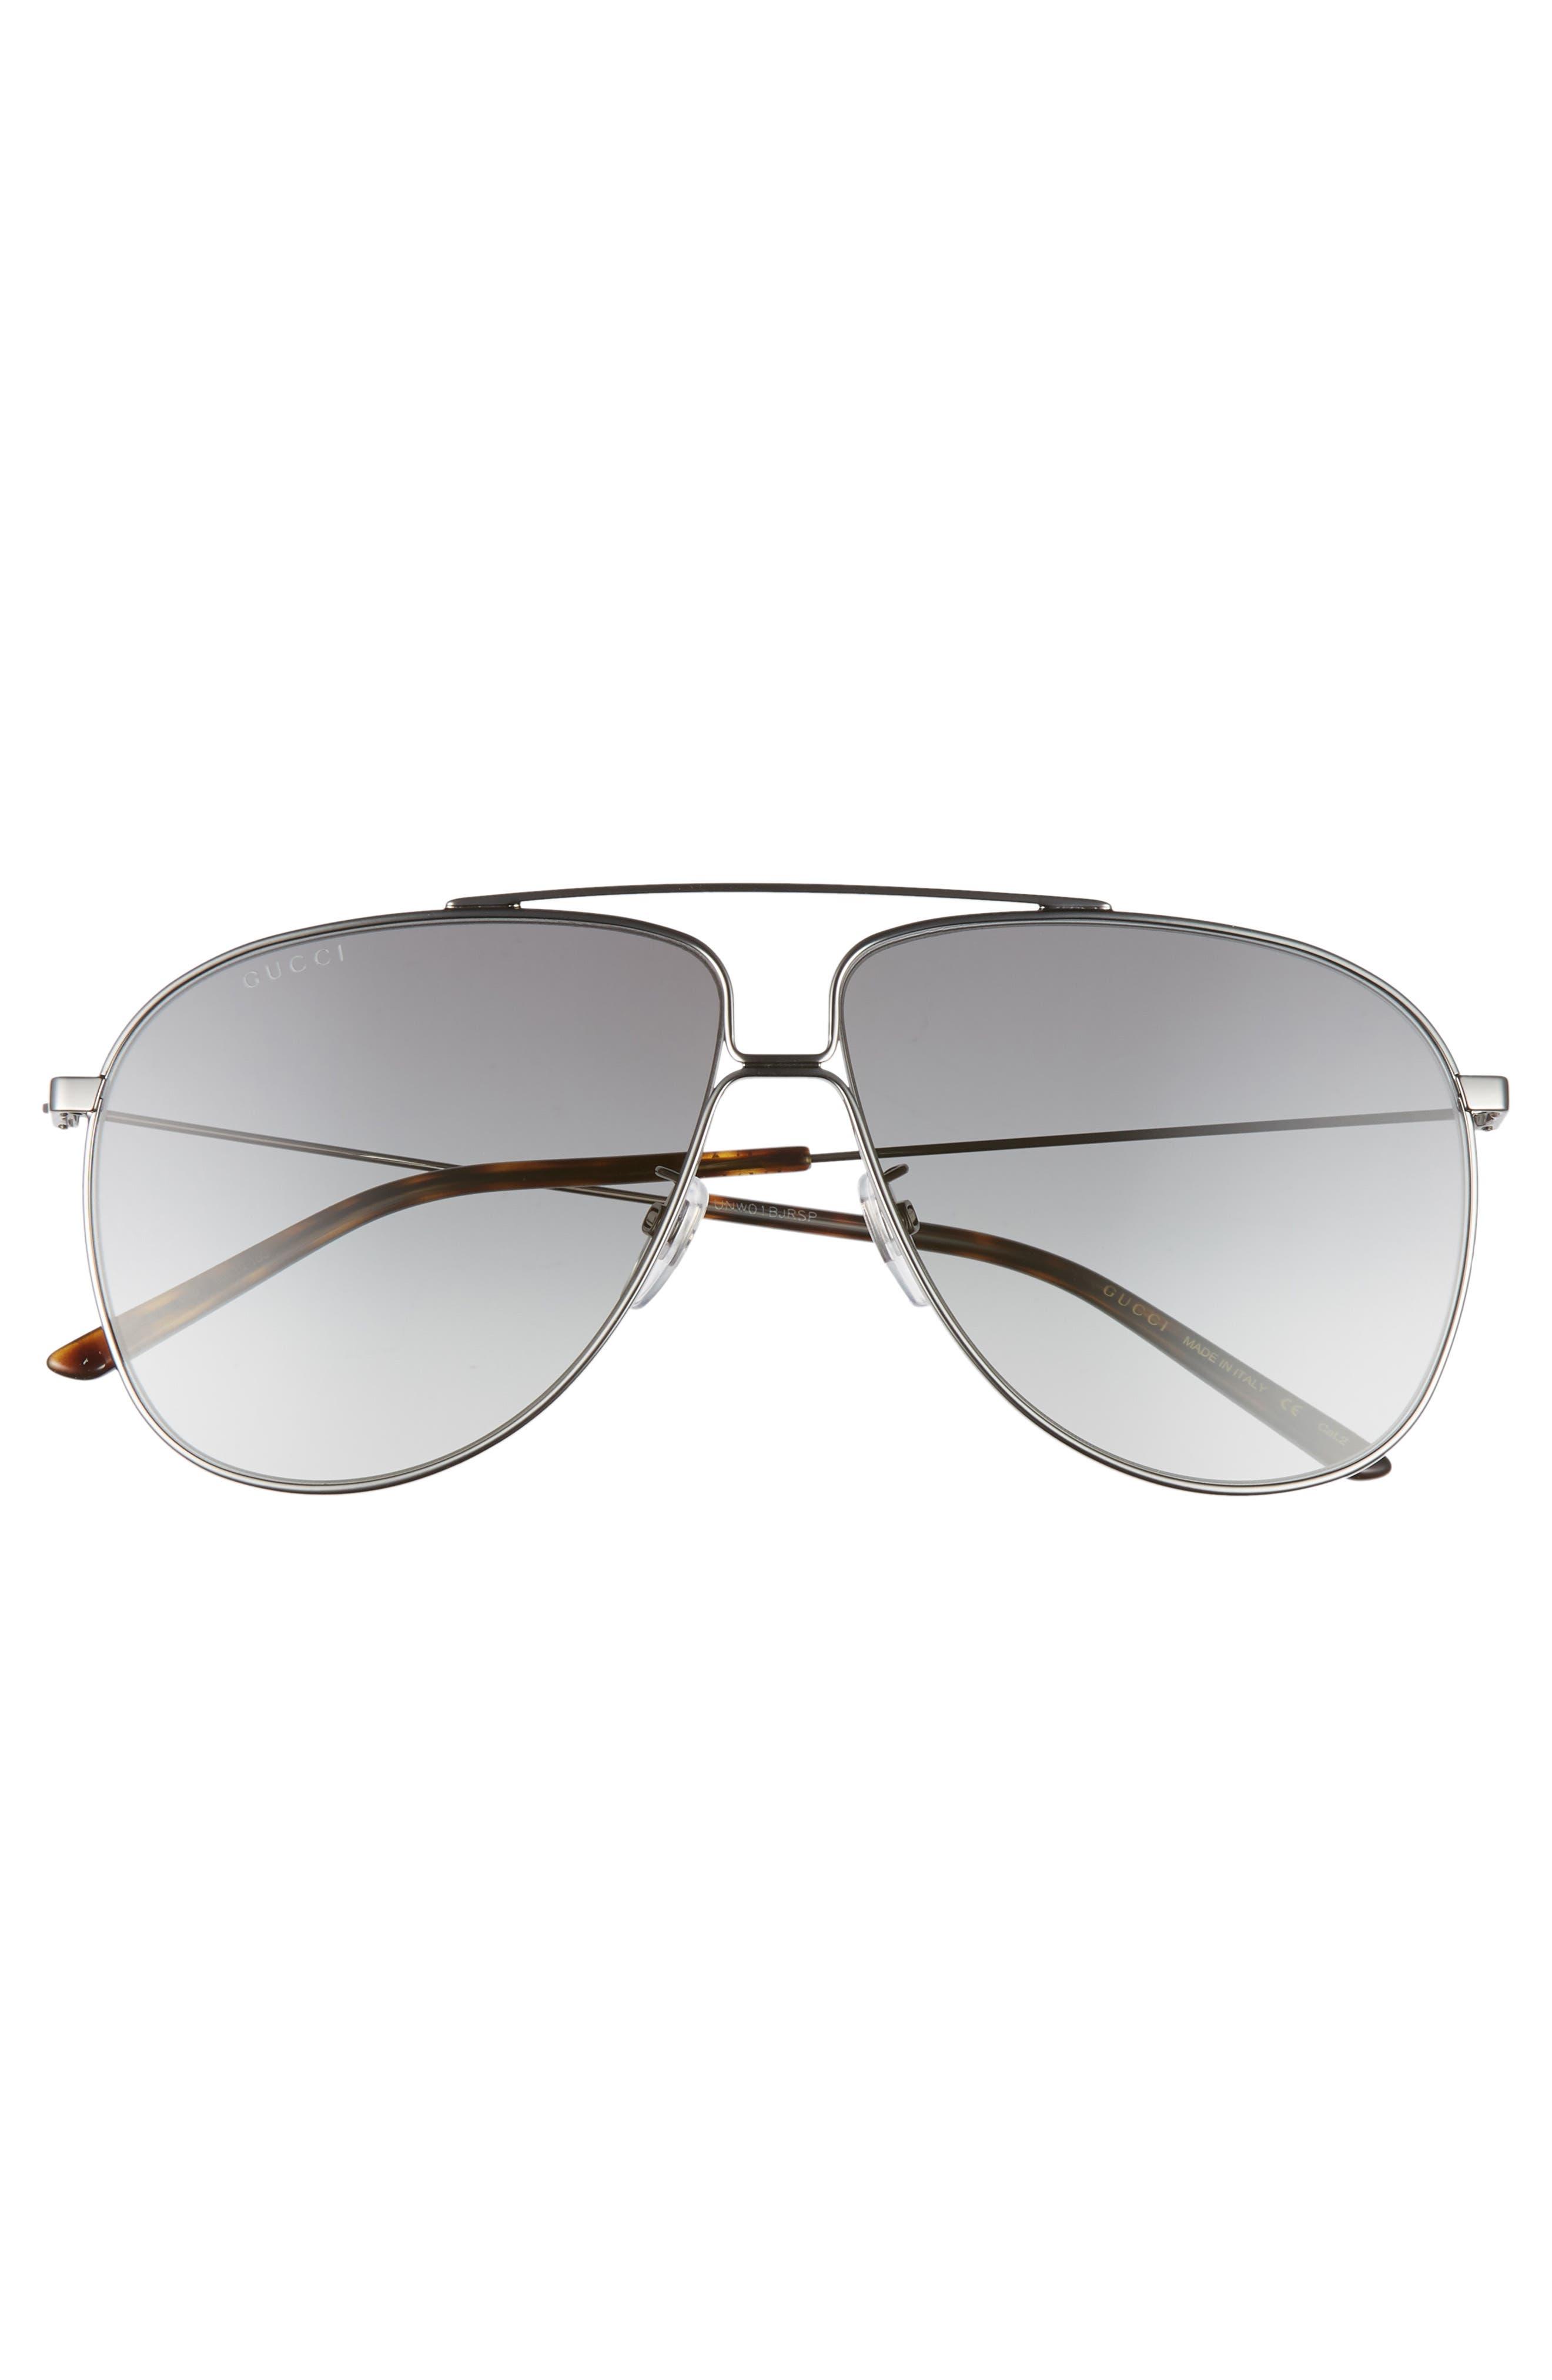 ,                             63mm Oversize Aviator Sunglasses,                             Alternate thumbnail 3, color,                             SHNY DK RUTH/ GREY GRAD